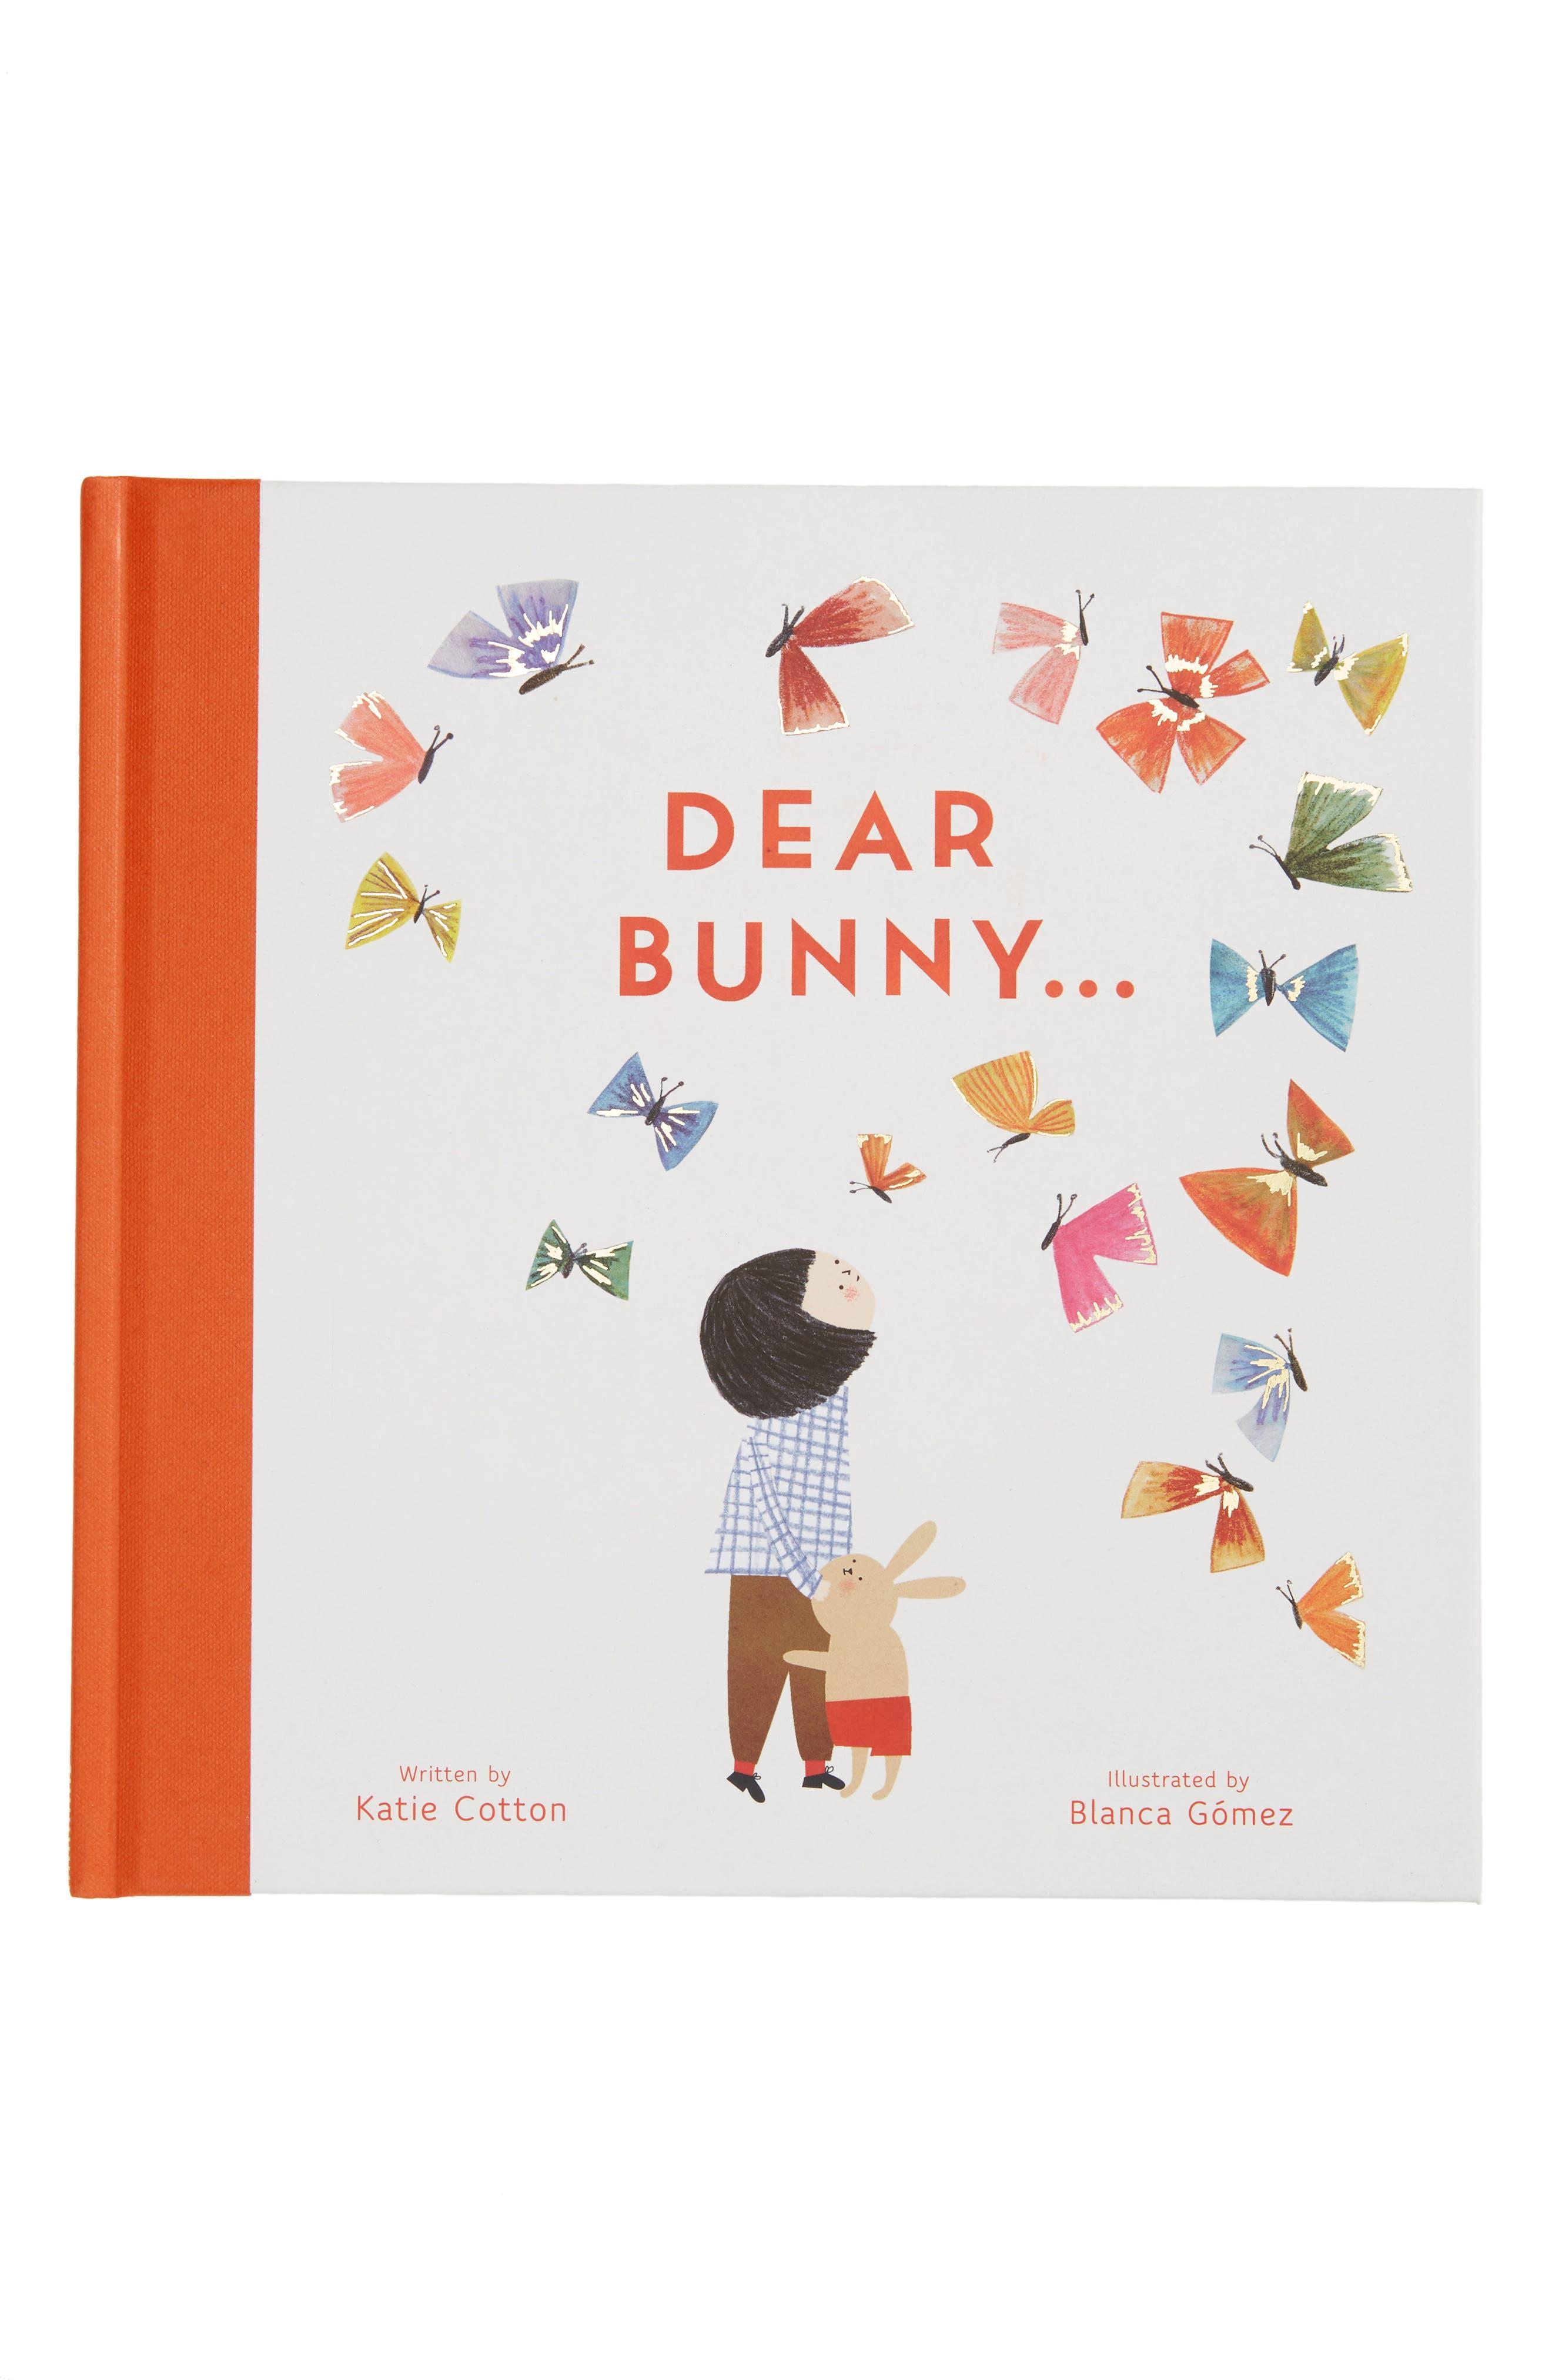 Quarto 'Dear Bunny' Book